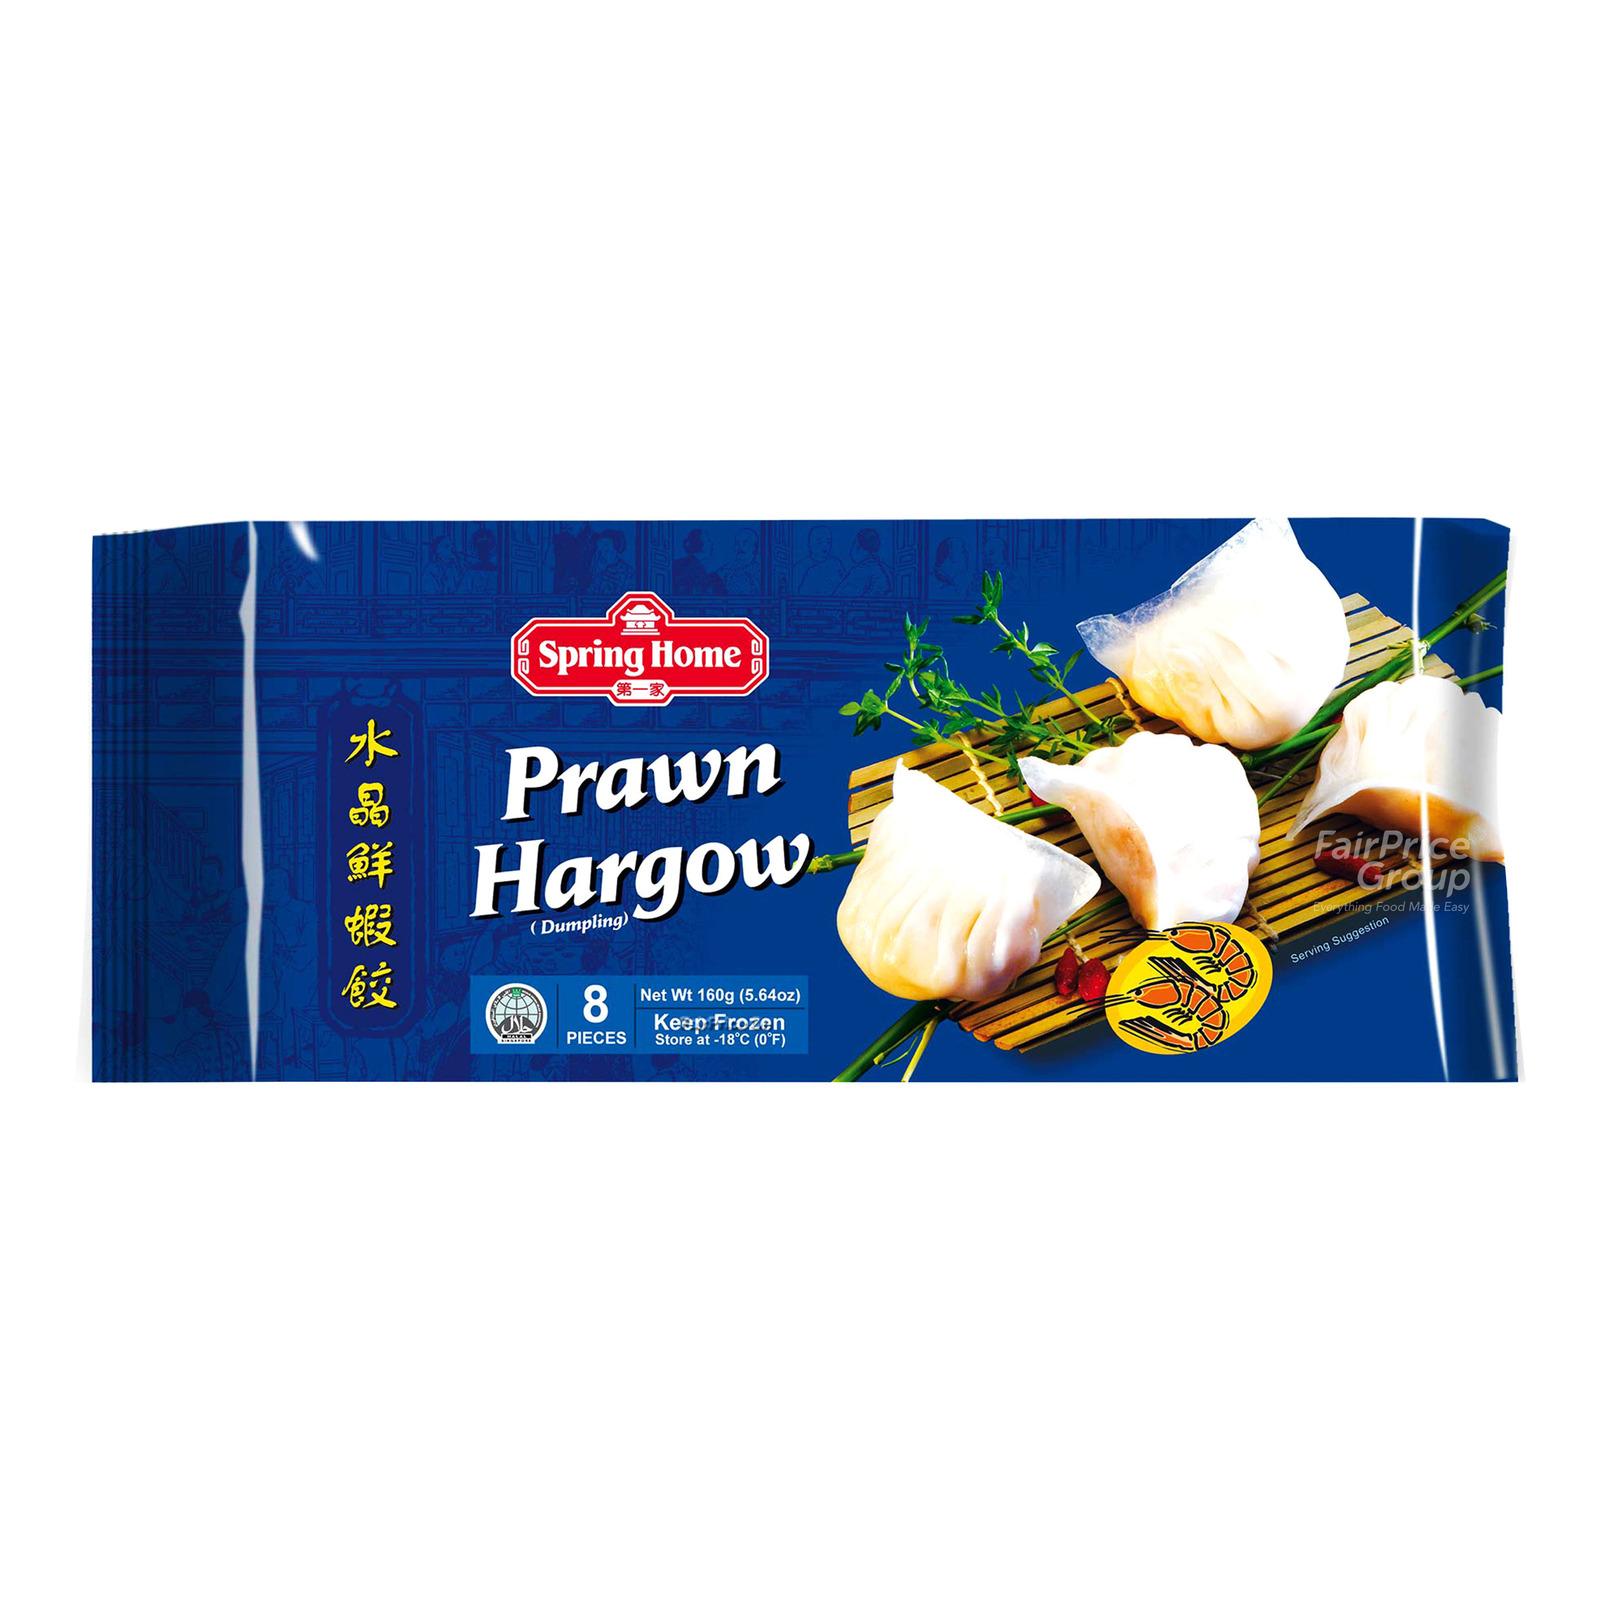 Spring Home Prawn Hargow